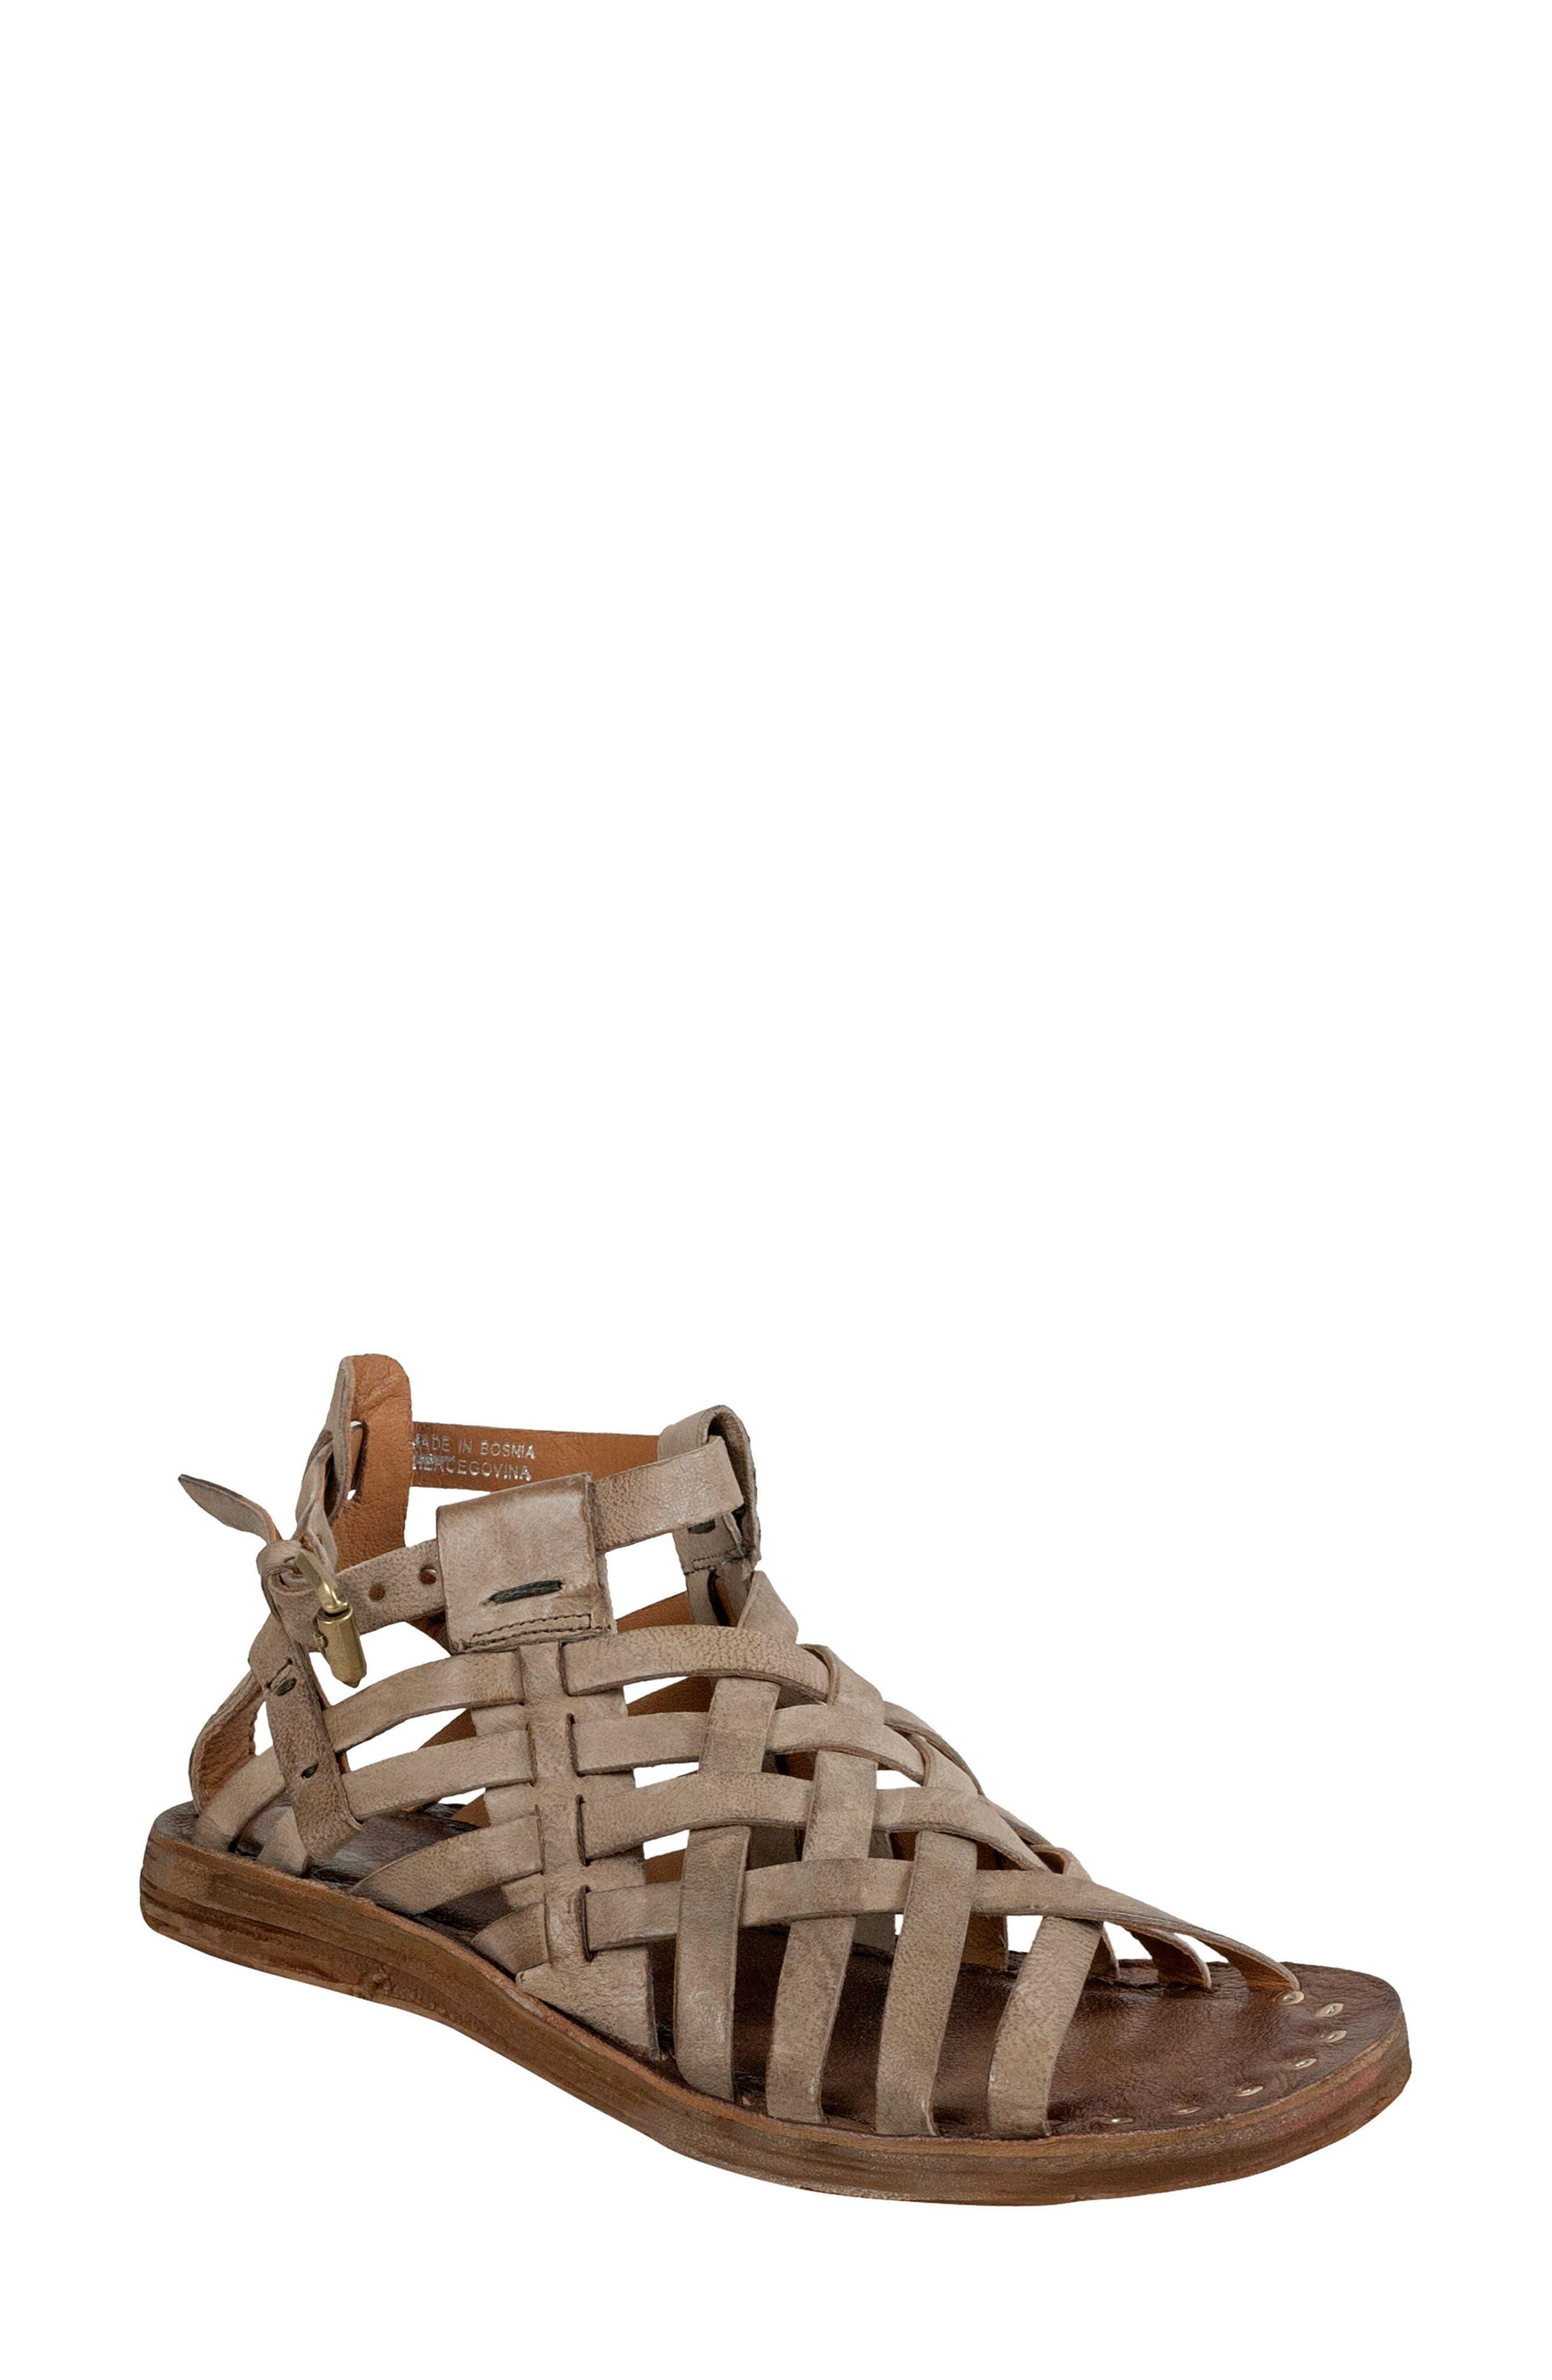 Ralston Gladiator Sandal,                         Main,                         color, TAUPE